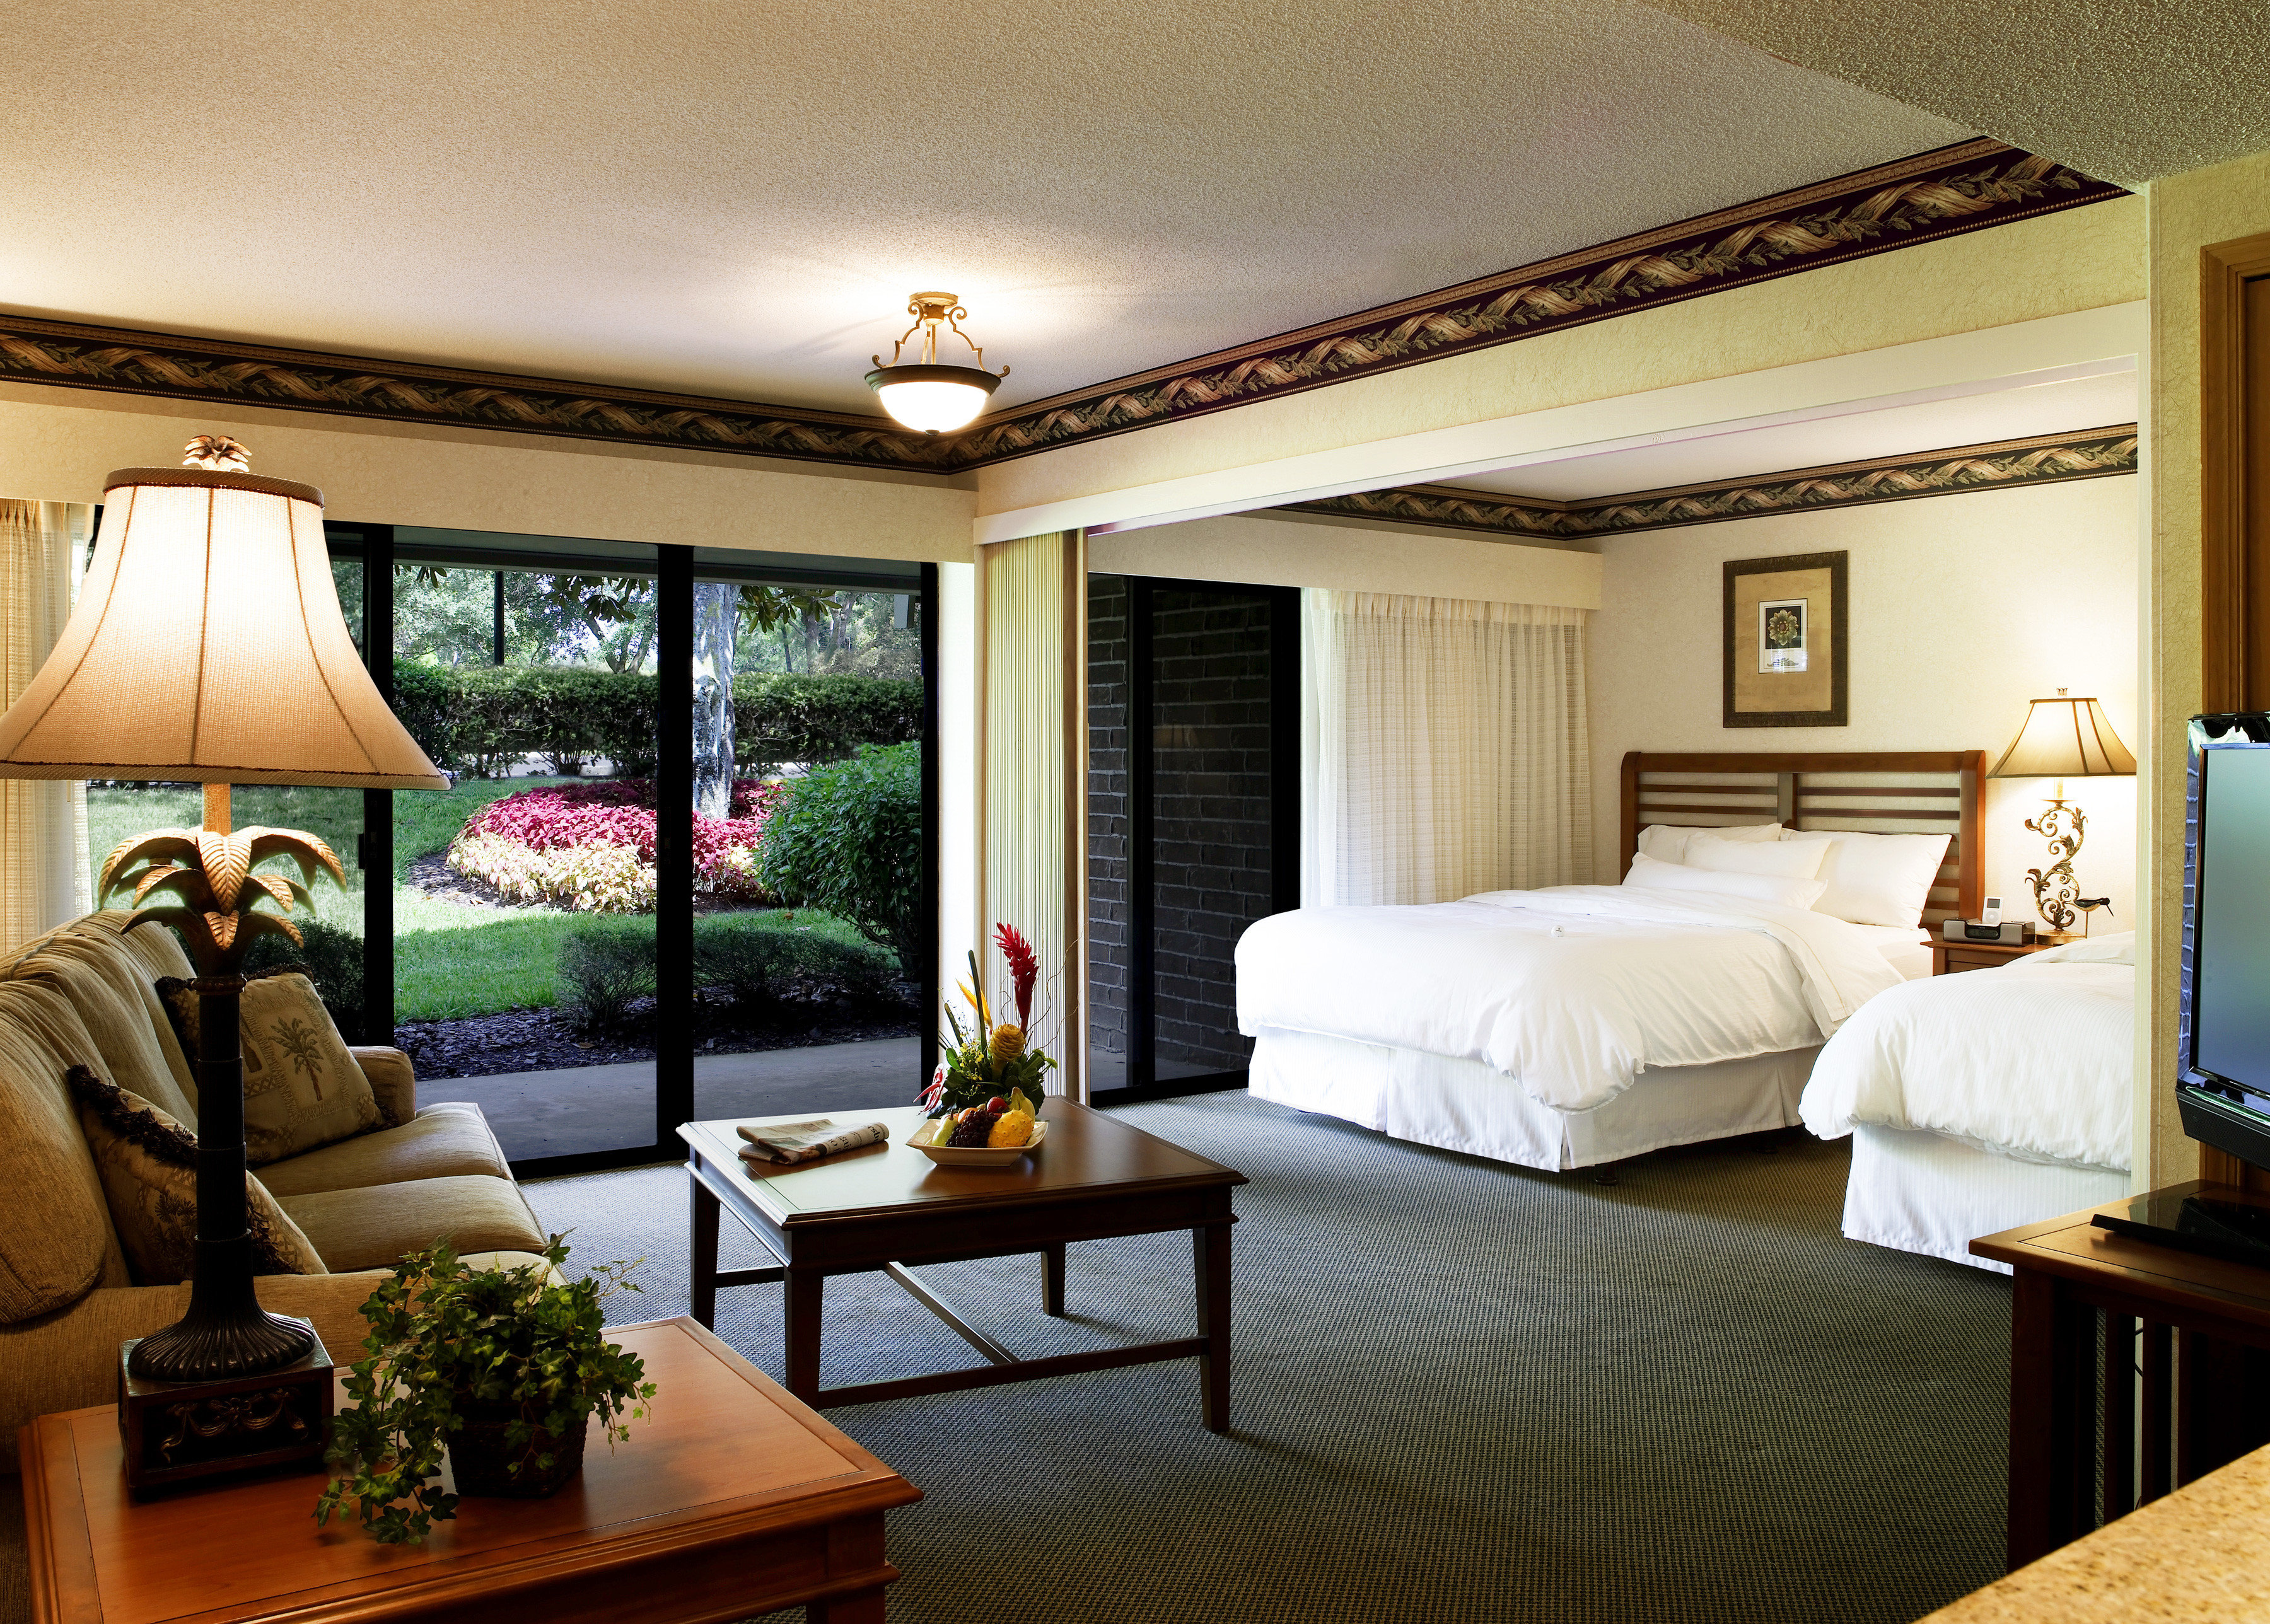 Bedroom Lounge Luxury Modern Suite sofa property living room home condominium Villa mansion nice Resort cottage lamp